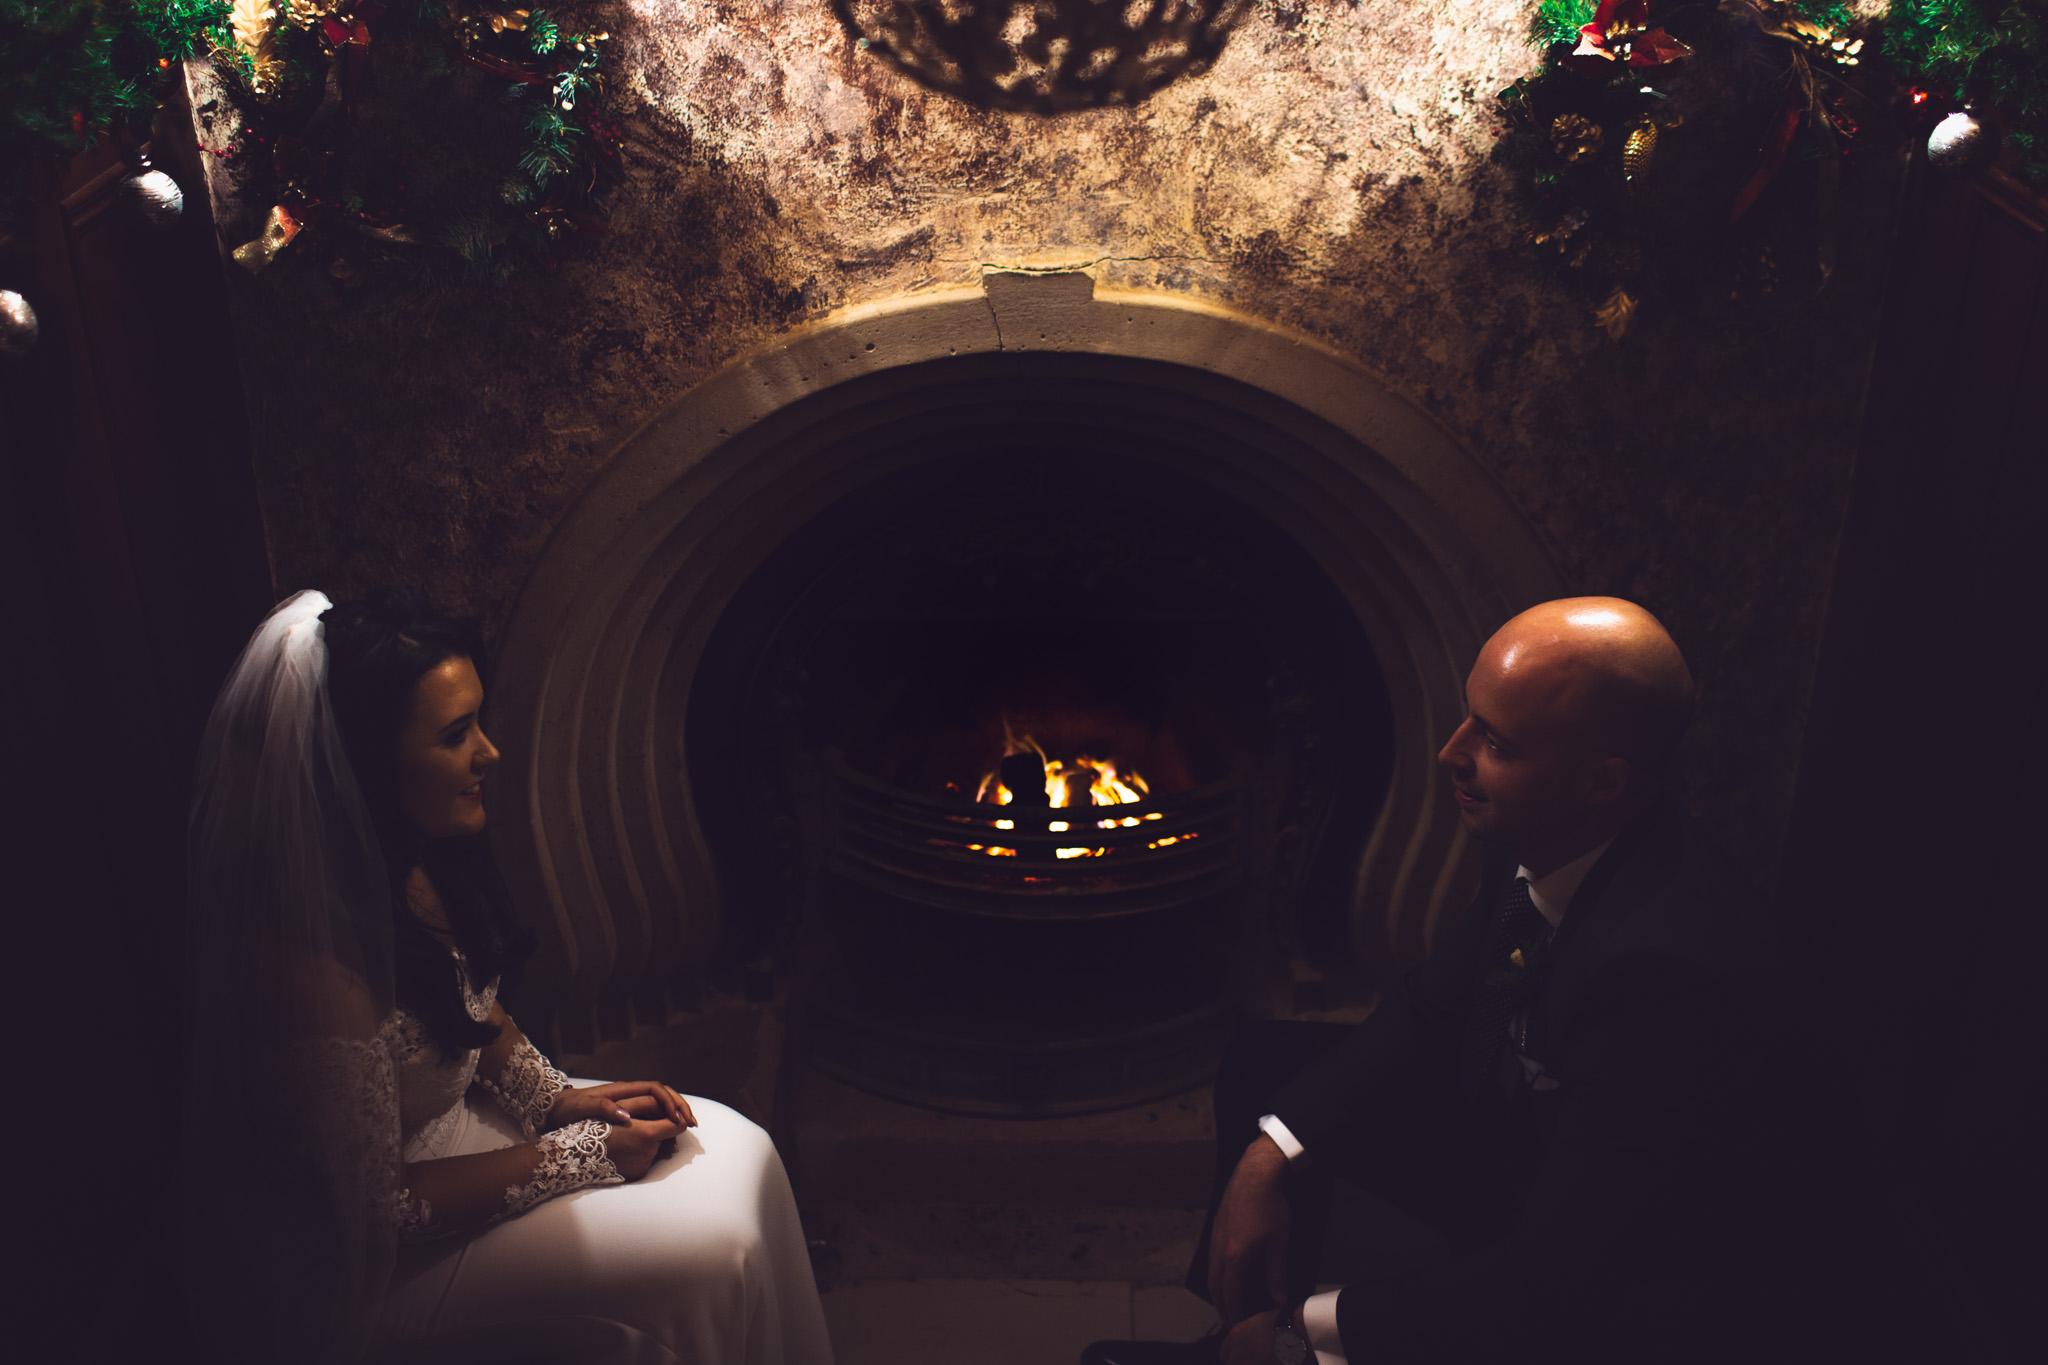 Mark_Barnes_Northern_Ireland_wedding_photographer_Harveys_Point_Donegall_Wedding_photography-Adam&Gemma-45.jpg